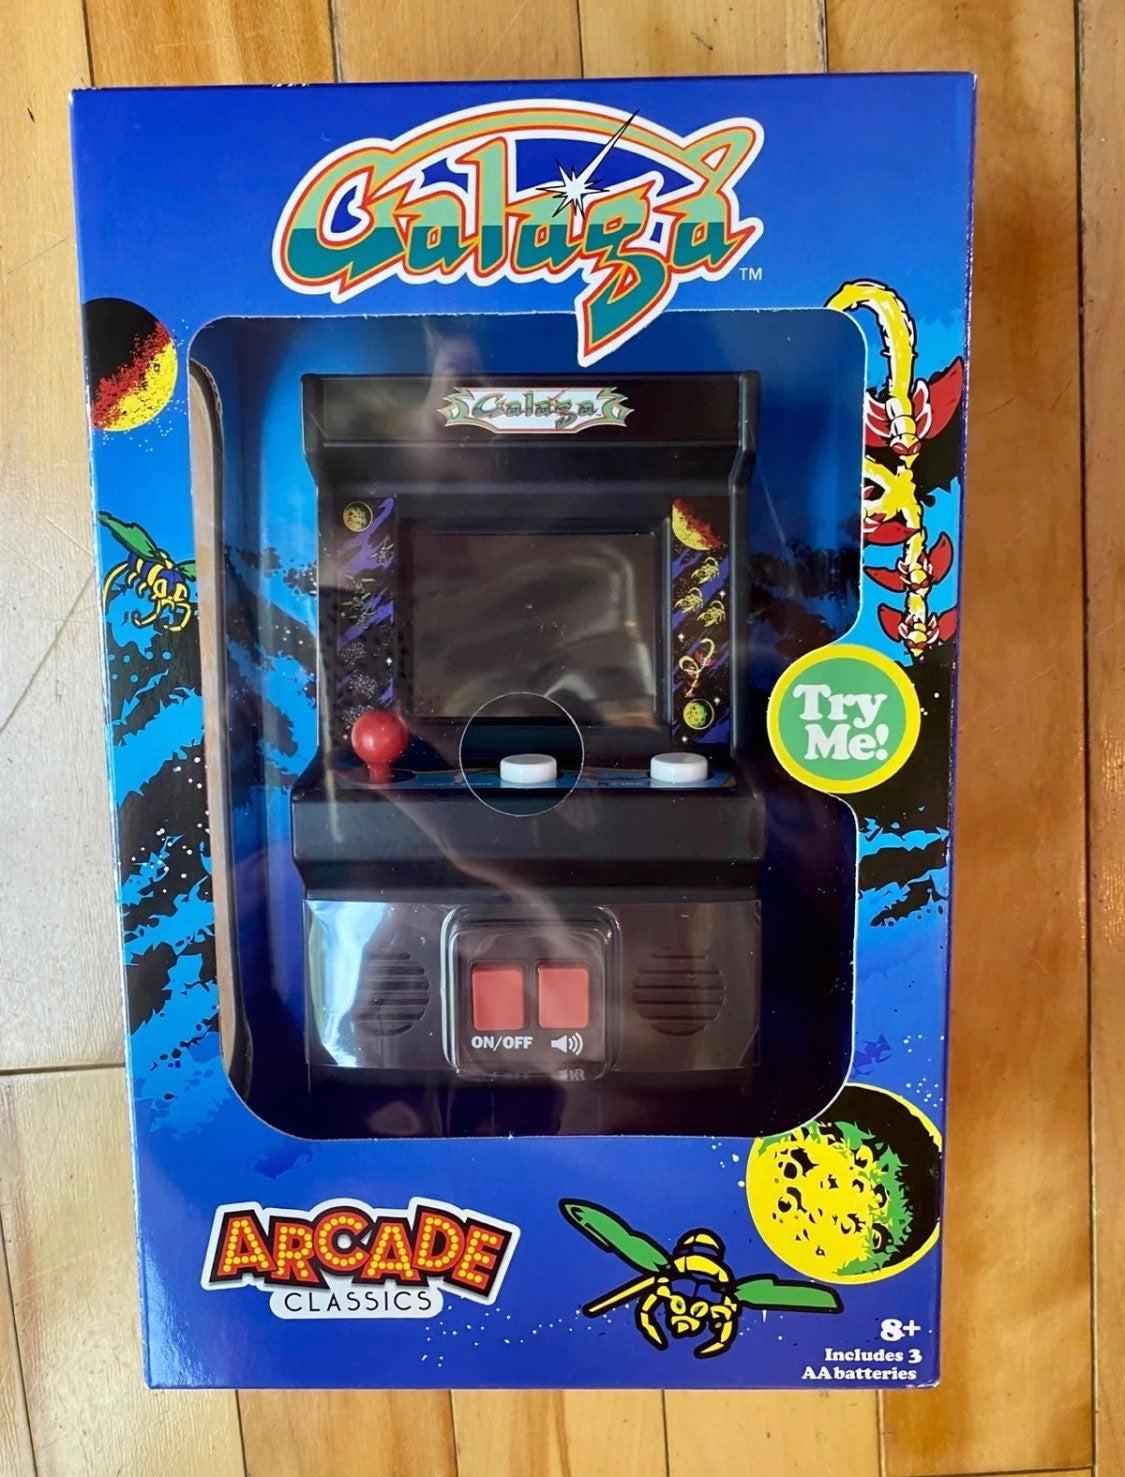 Galaga classic arcade game